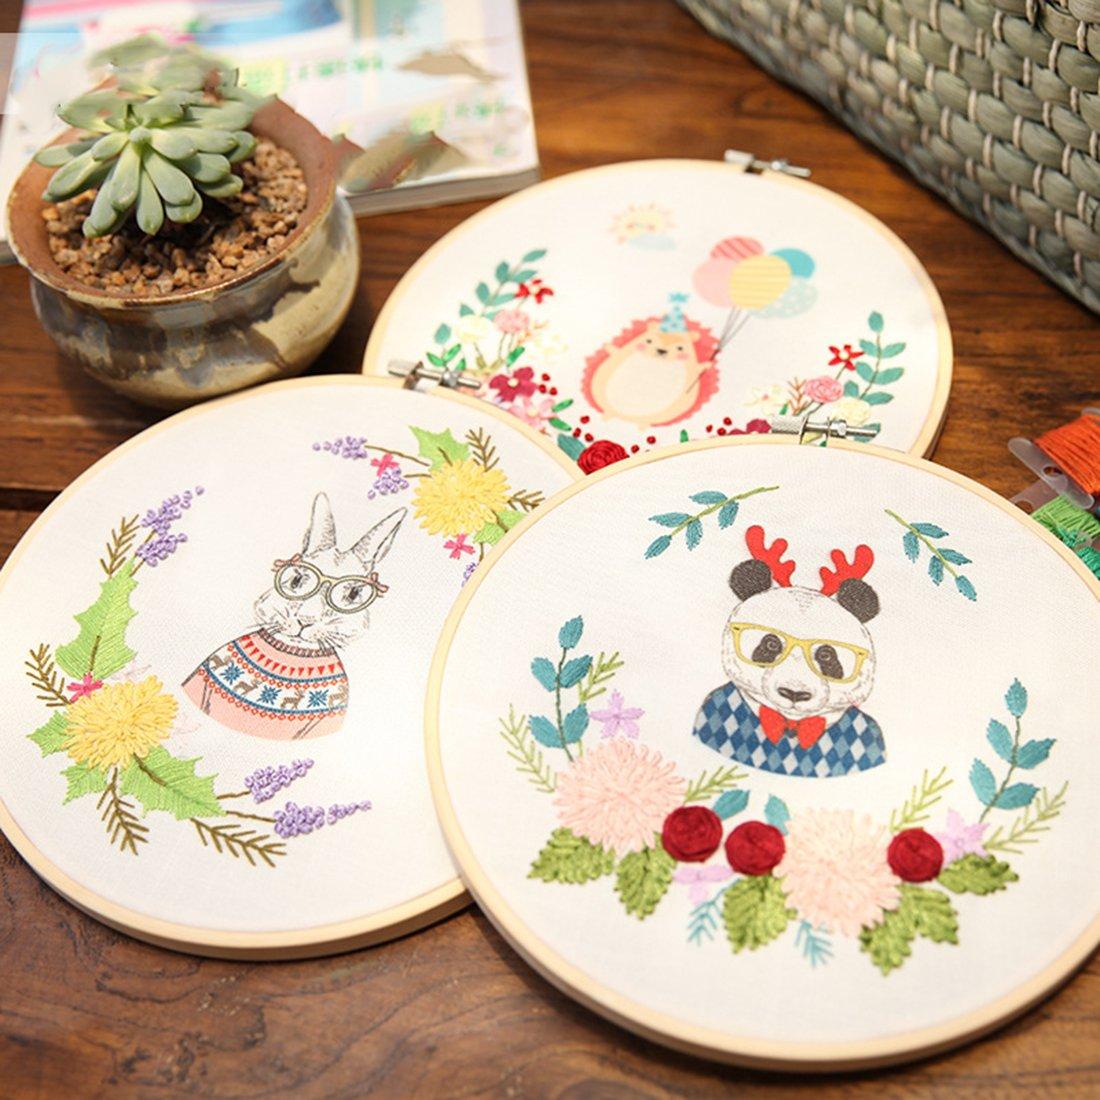 Ivinxy Embroidery Hoops working